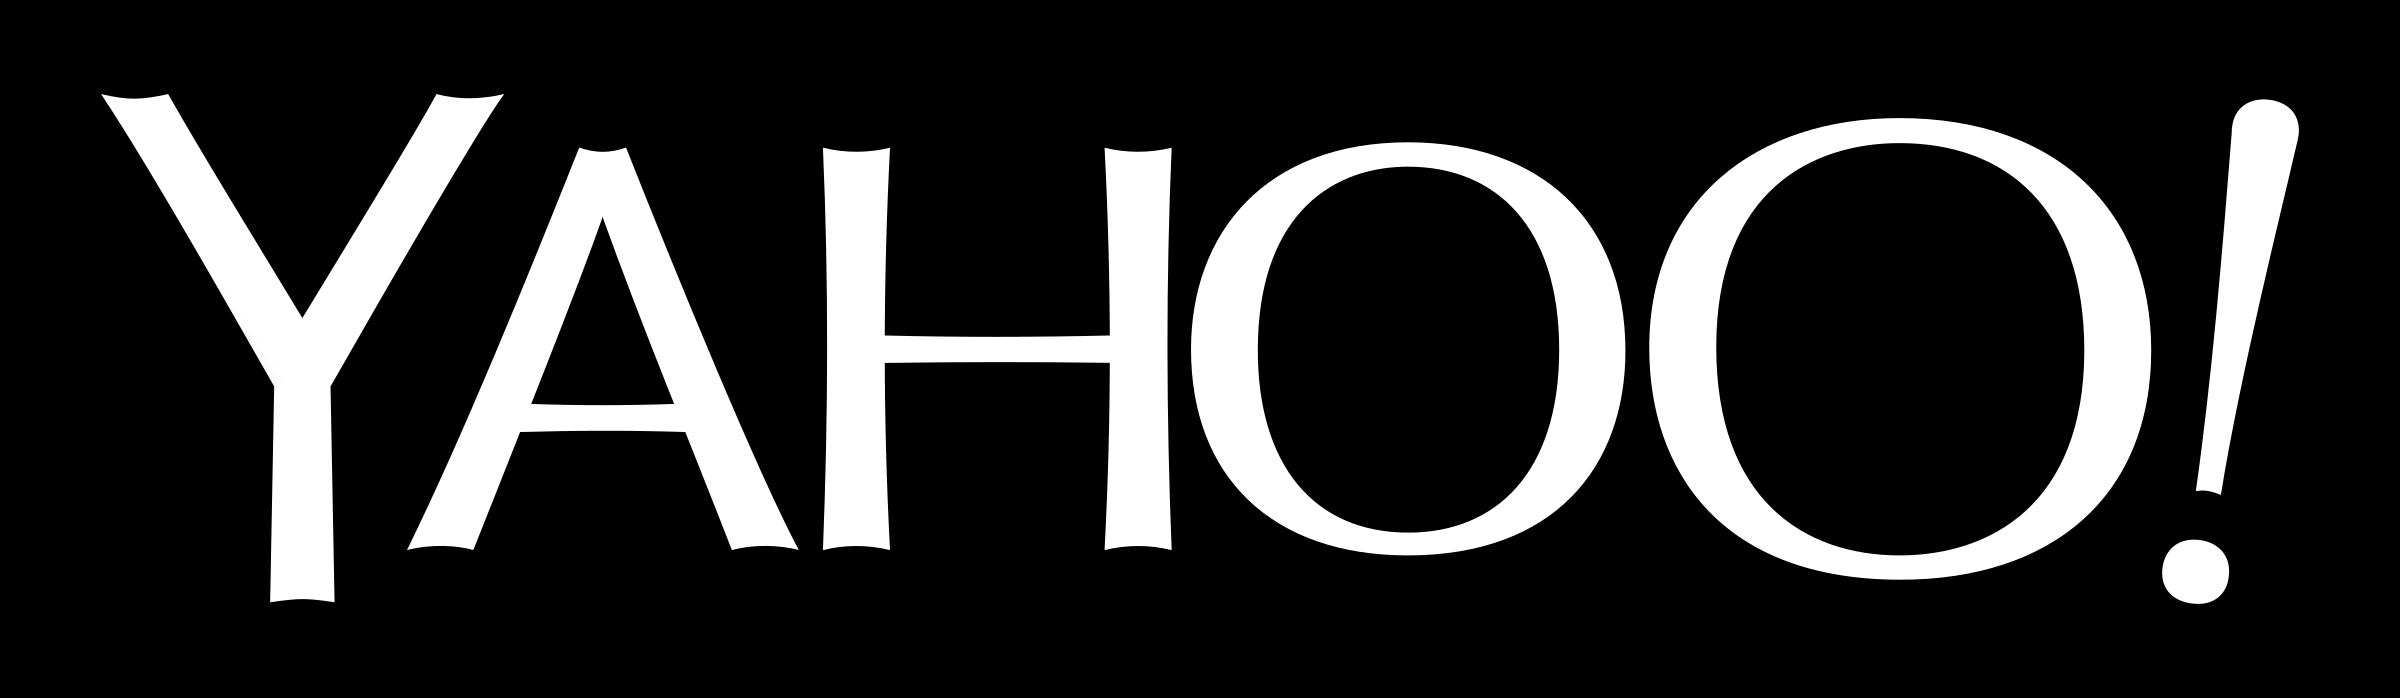 Yahoo Logo Png Transparent Svg Vector Freebie Supply